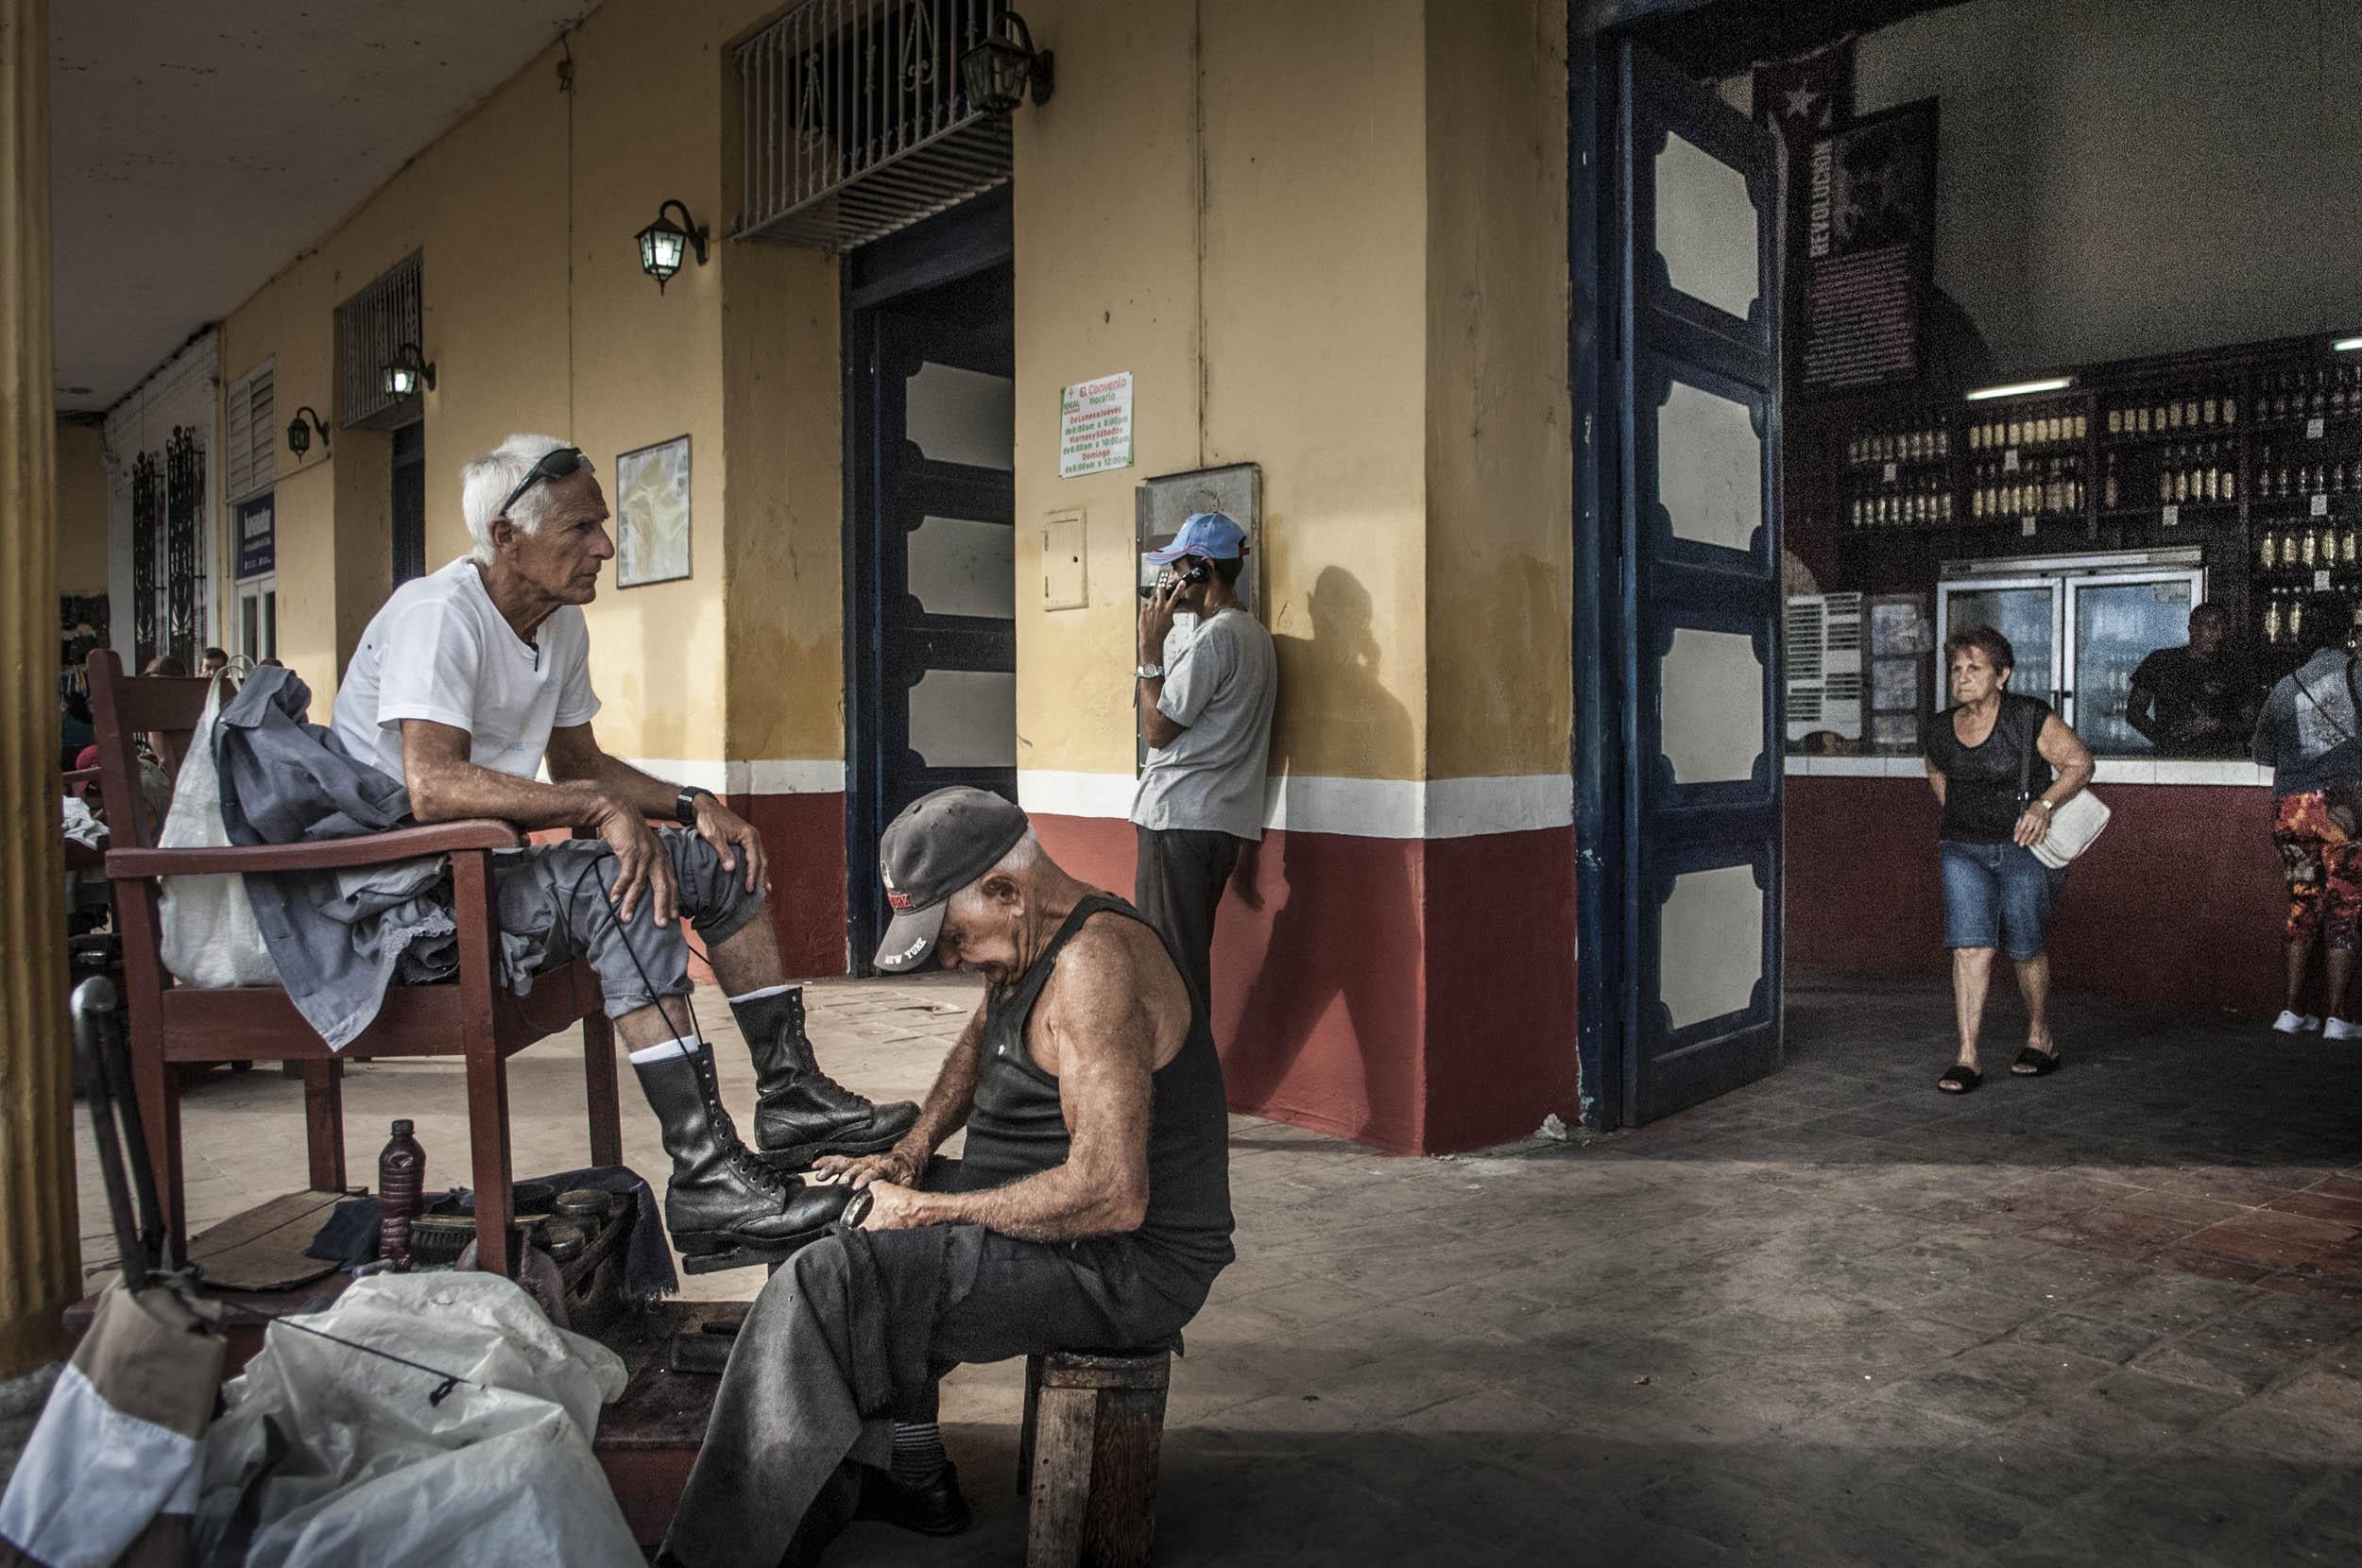 Sancti Spiritus - Cuba - Hector Garrido, Aerial and human photography